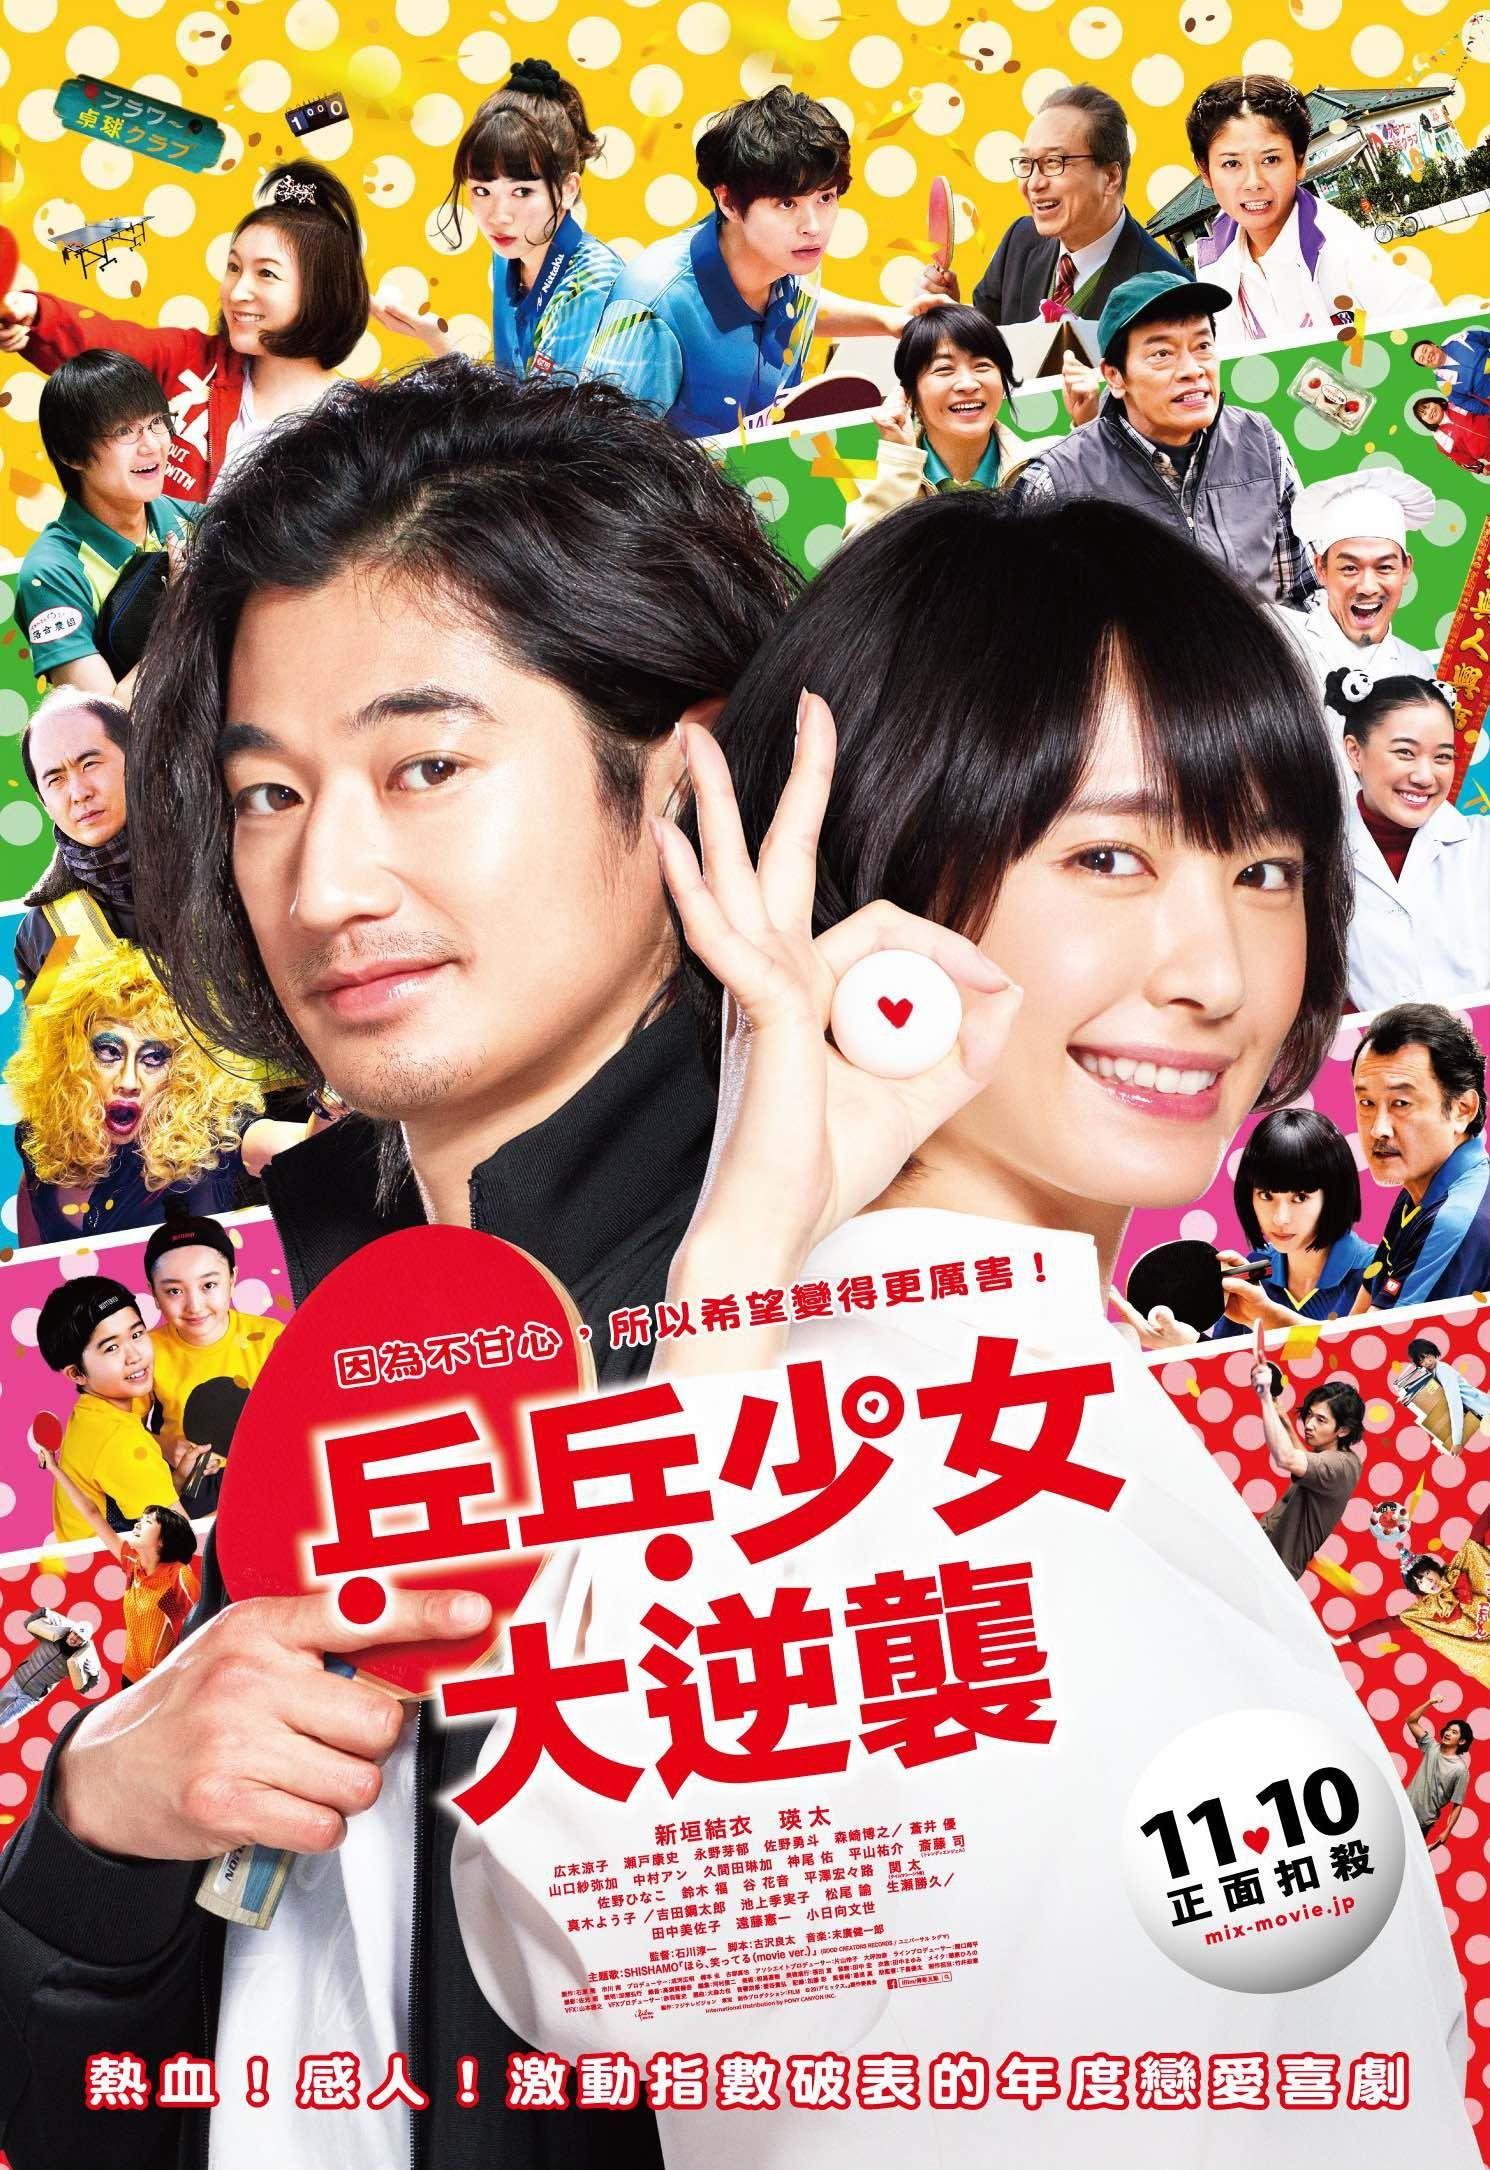 Coffee & Vanilla (2019) ForJoyTV Japanese Drama